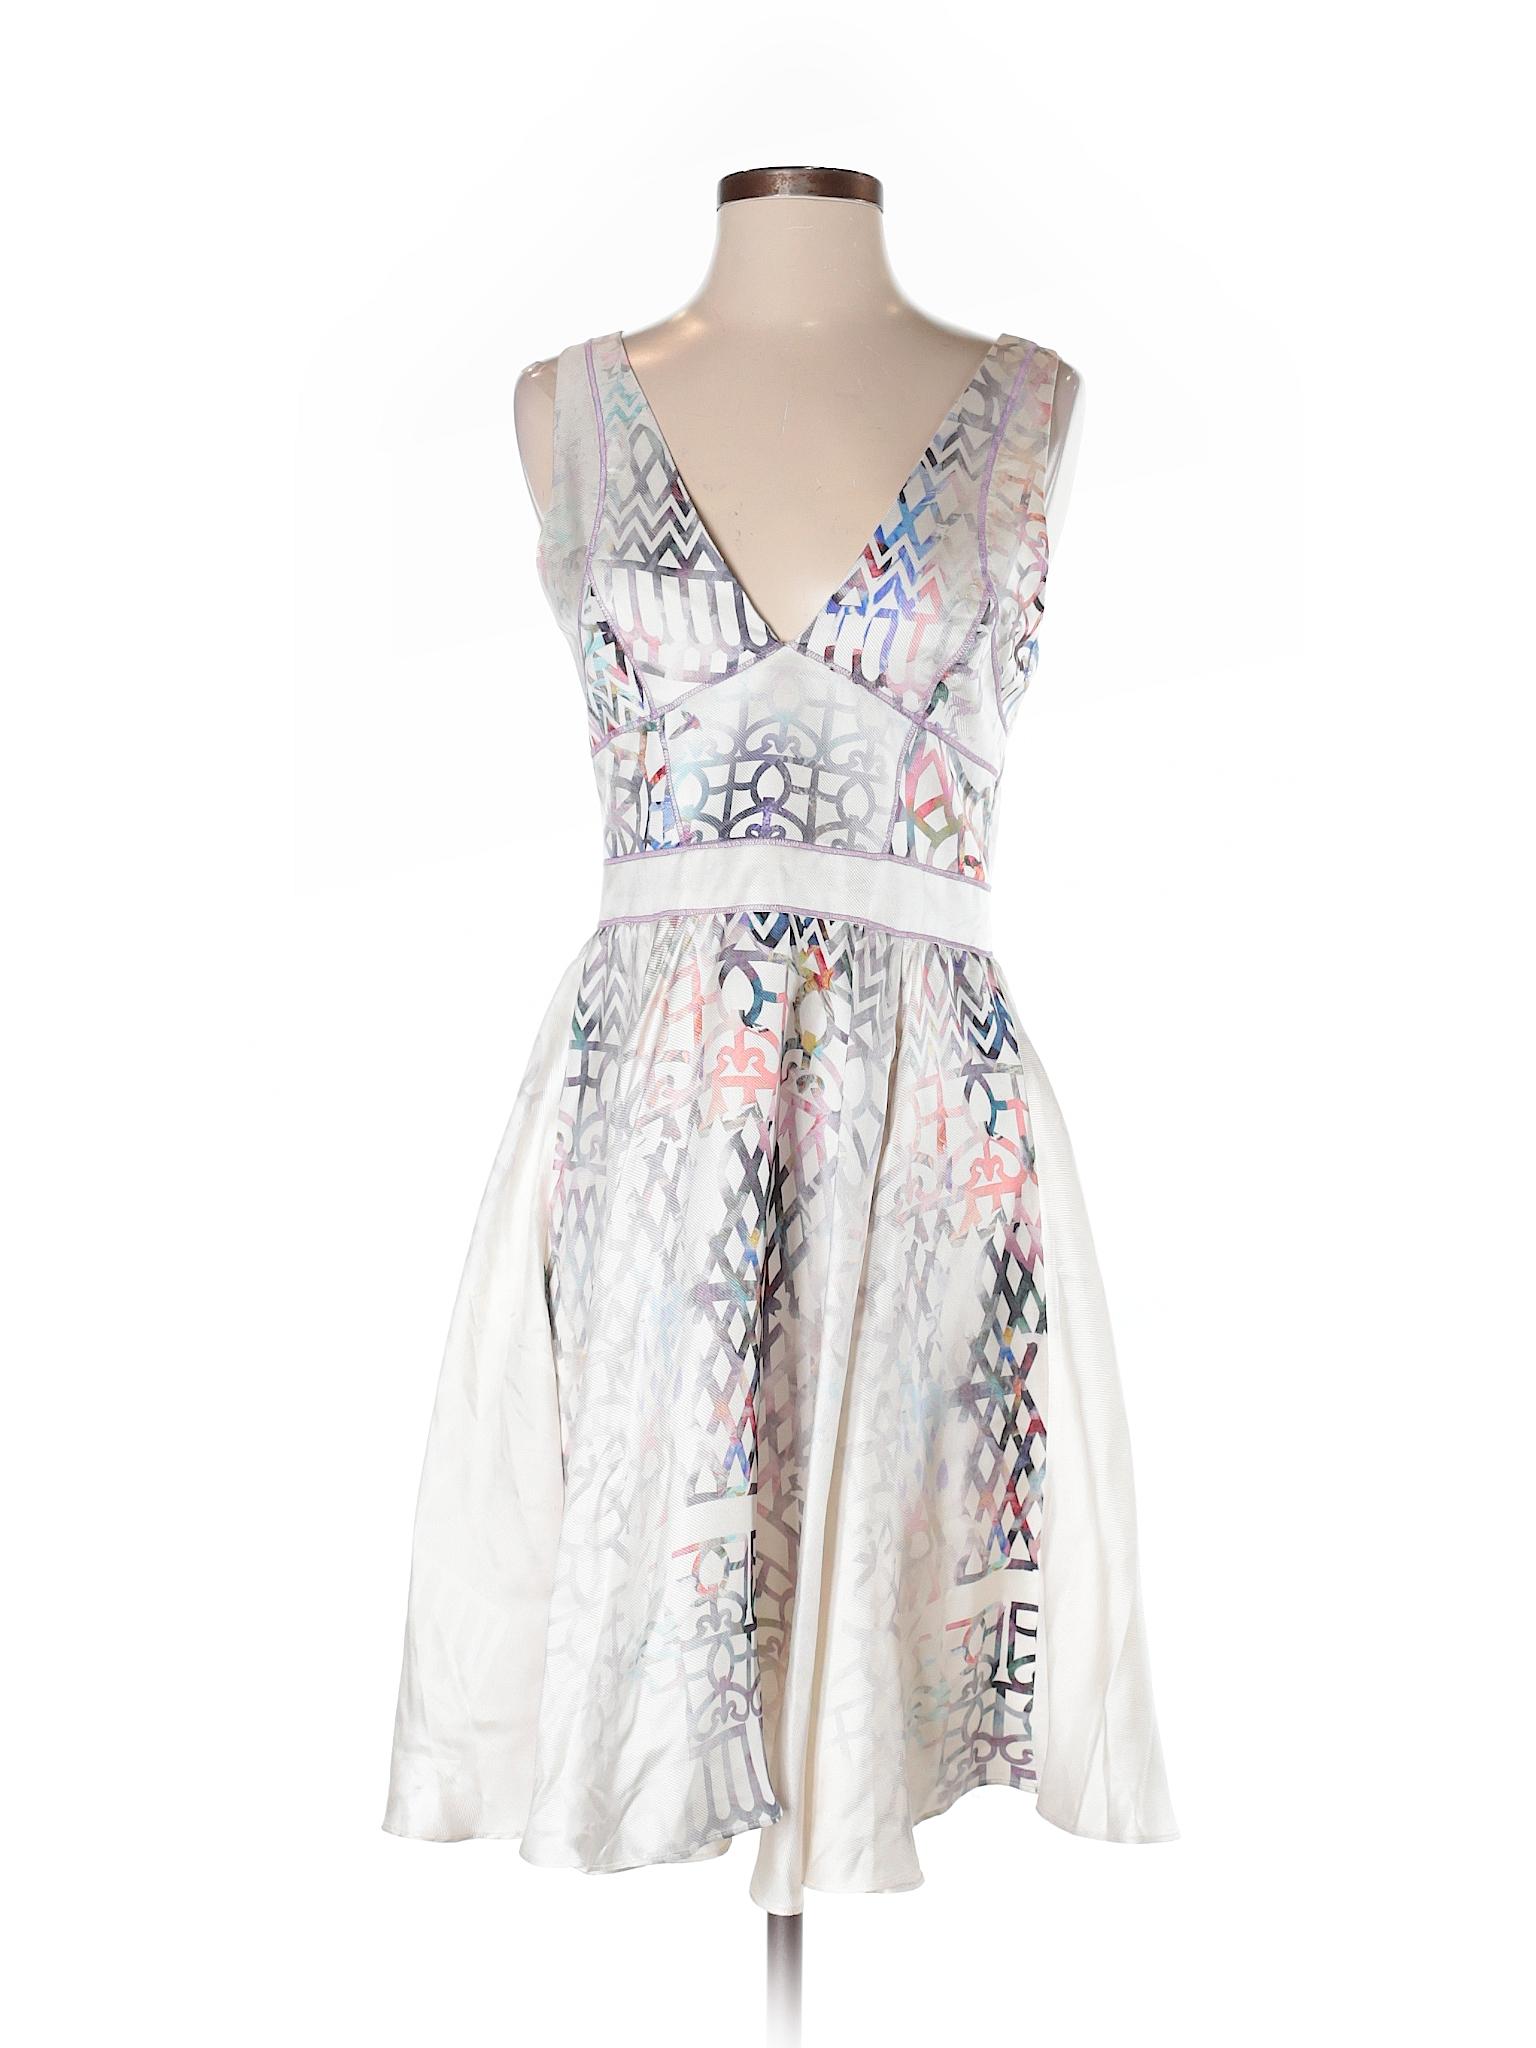 Cynthia Dress Cynthia Dress Casual Selling Selling Rowley Rowley Selling Casual zBqIwYa64